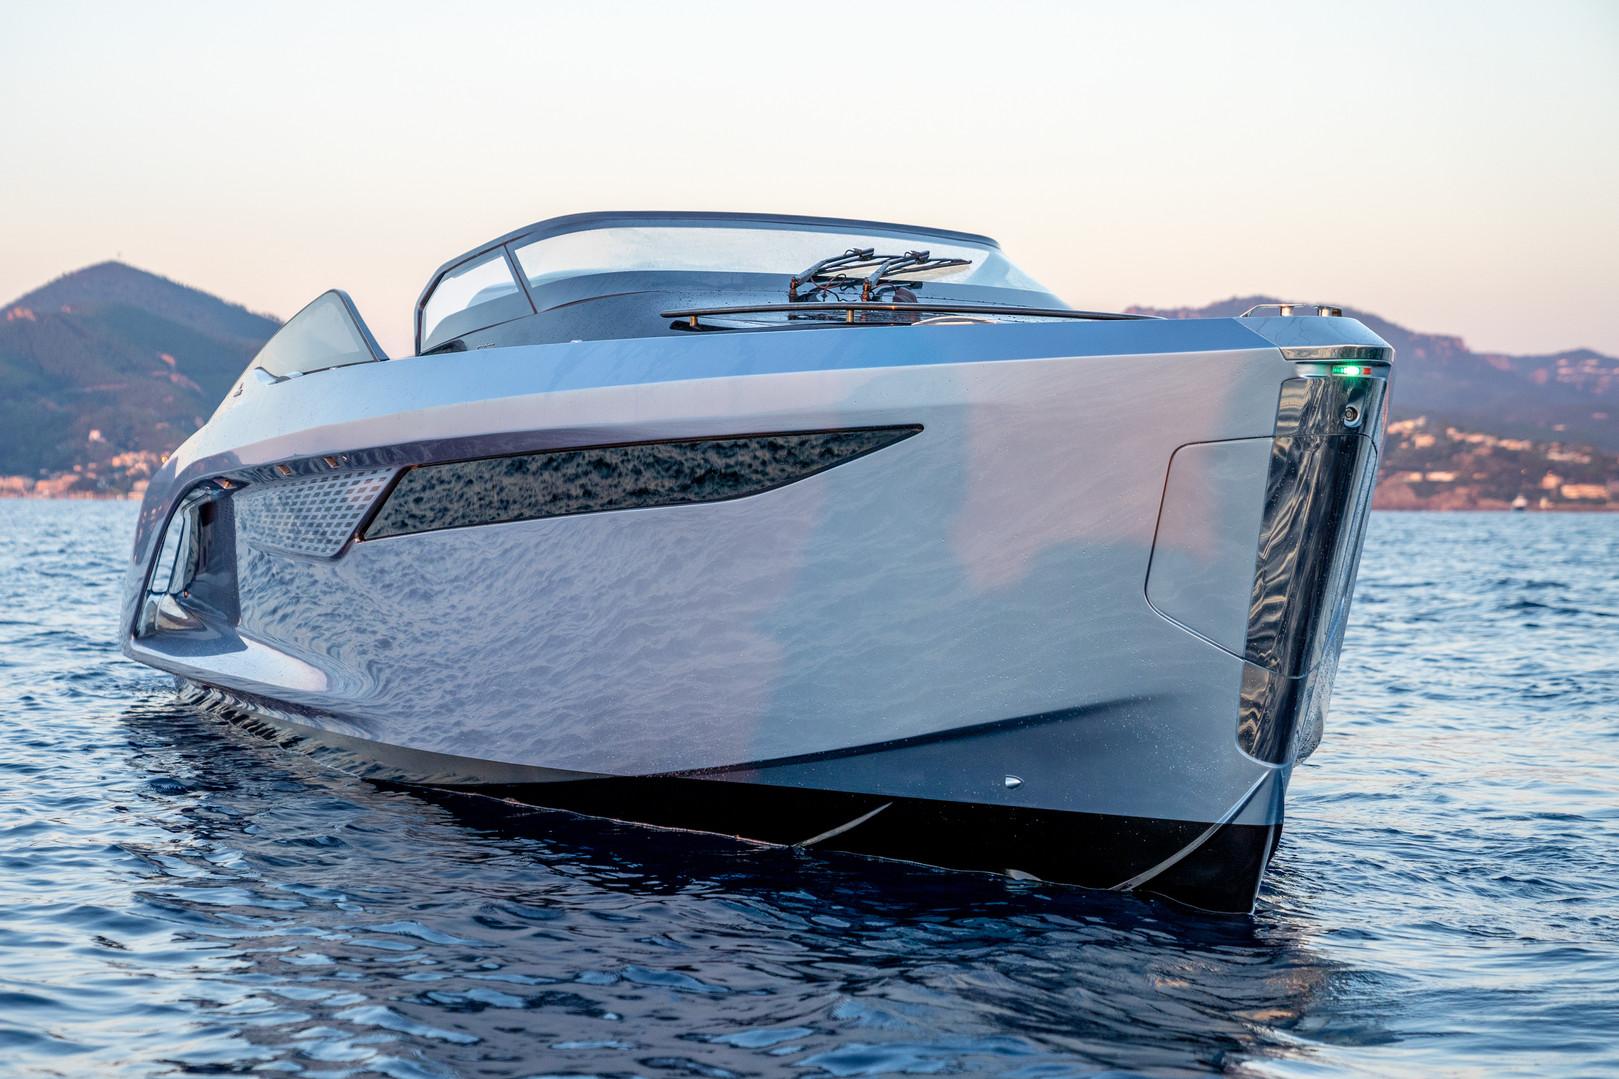 r35-exterior-ice-blue-hull